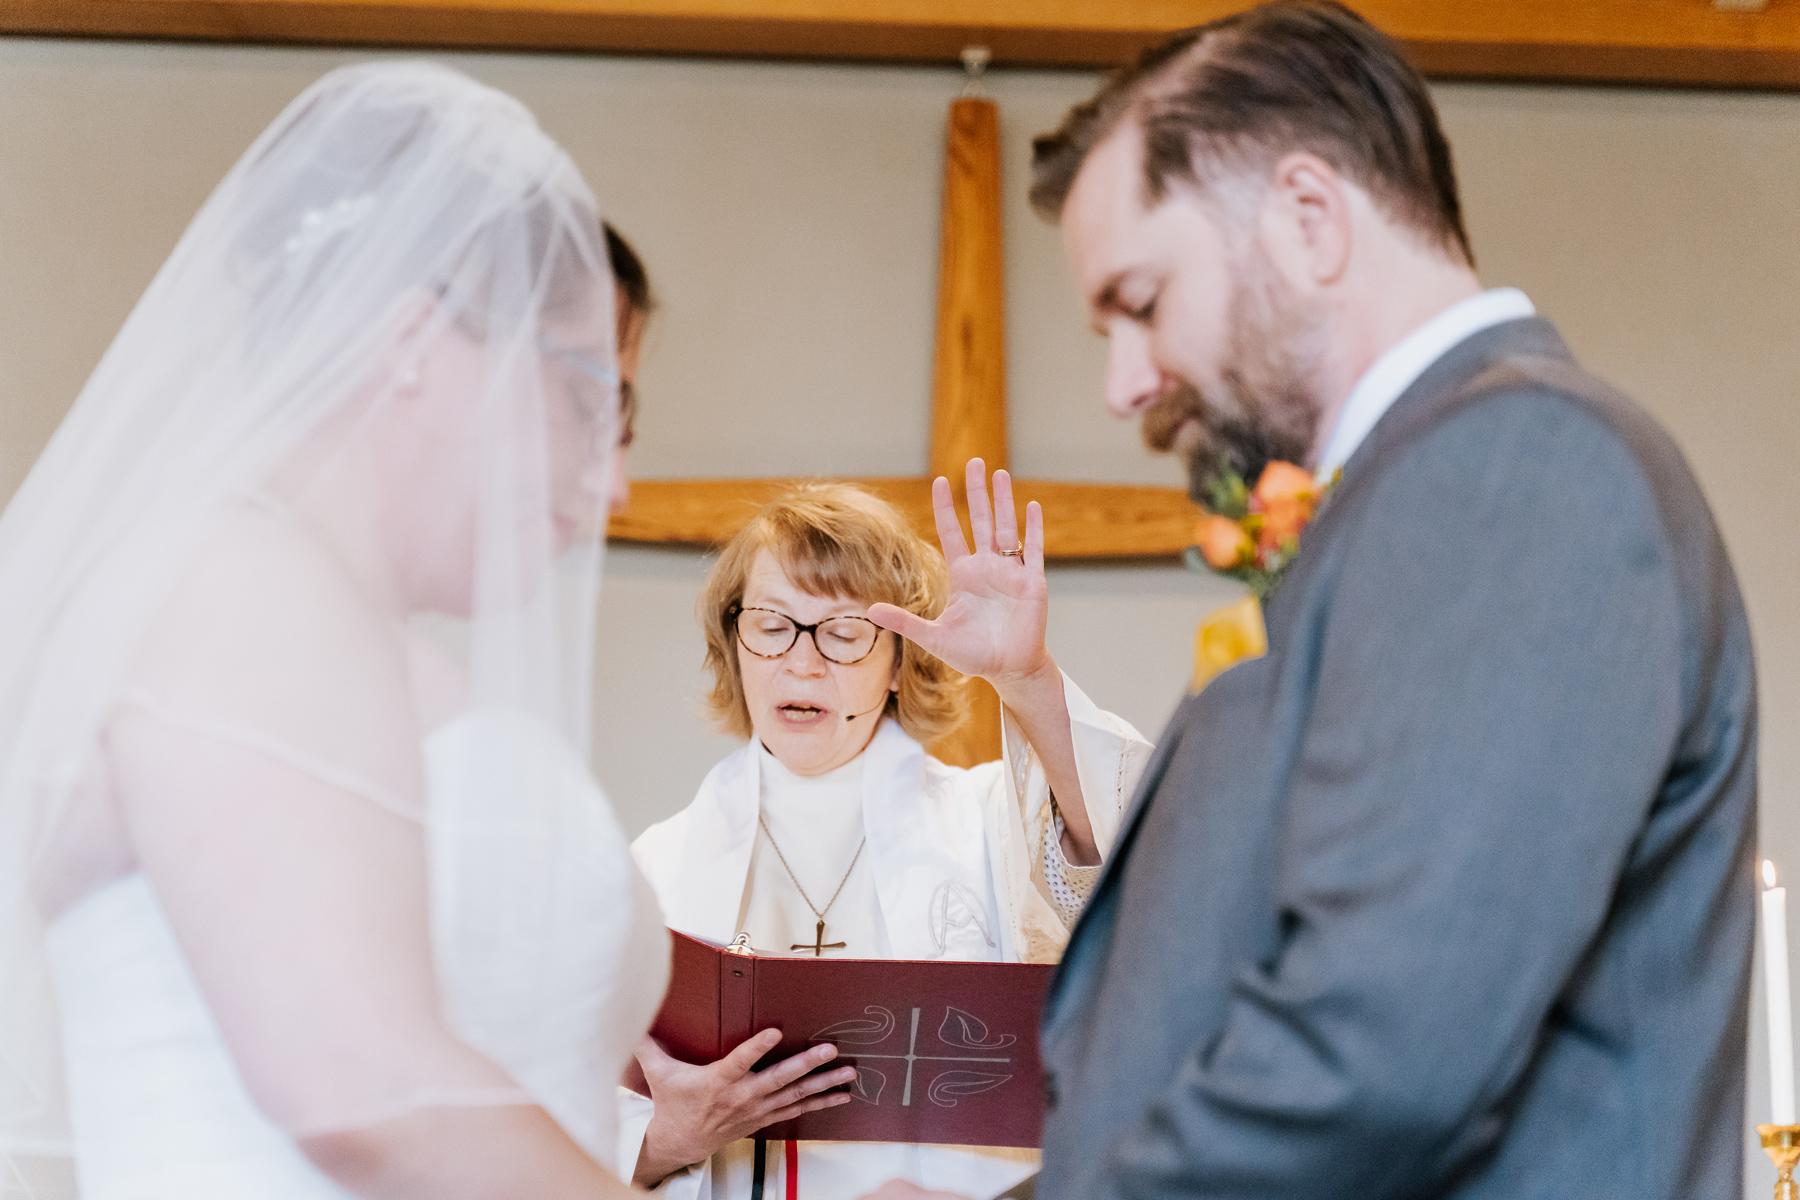 lethbridge-wedding-photography-pd2019-22